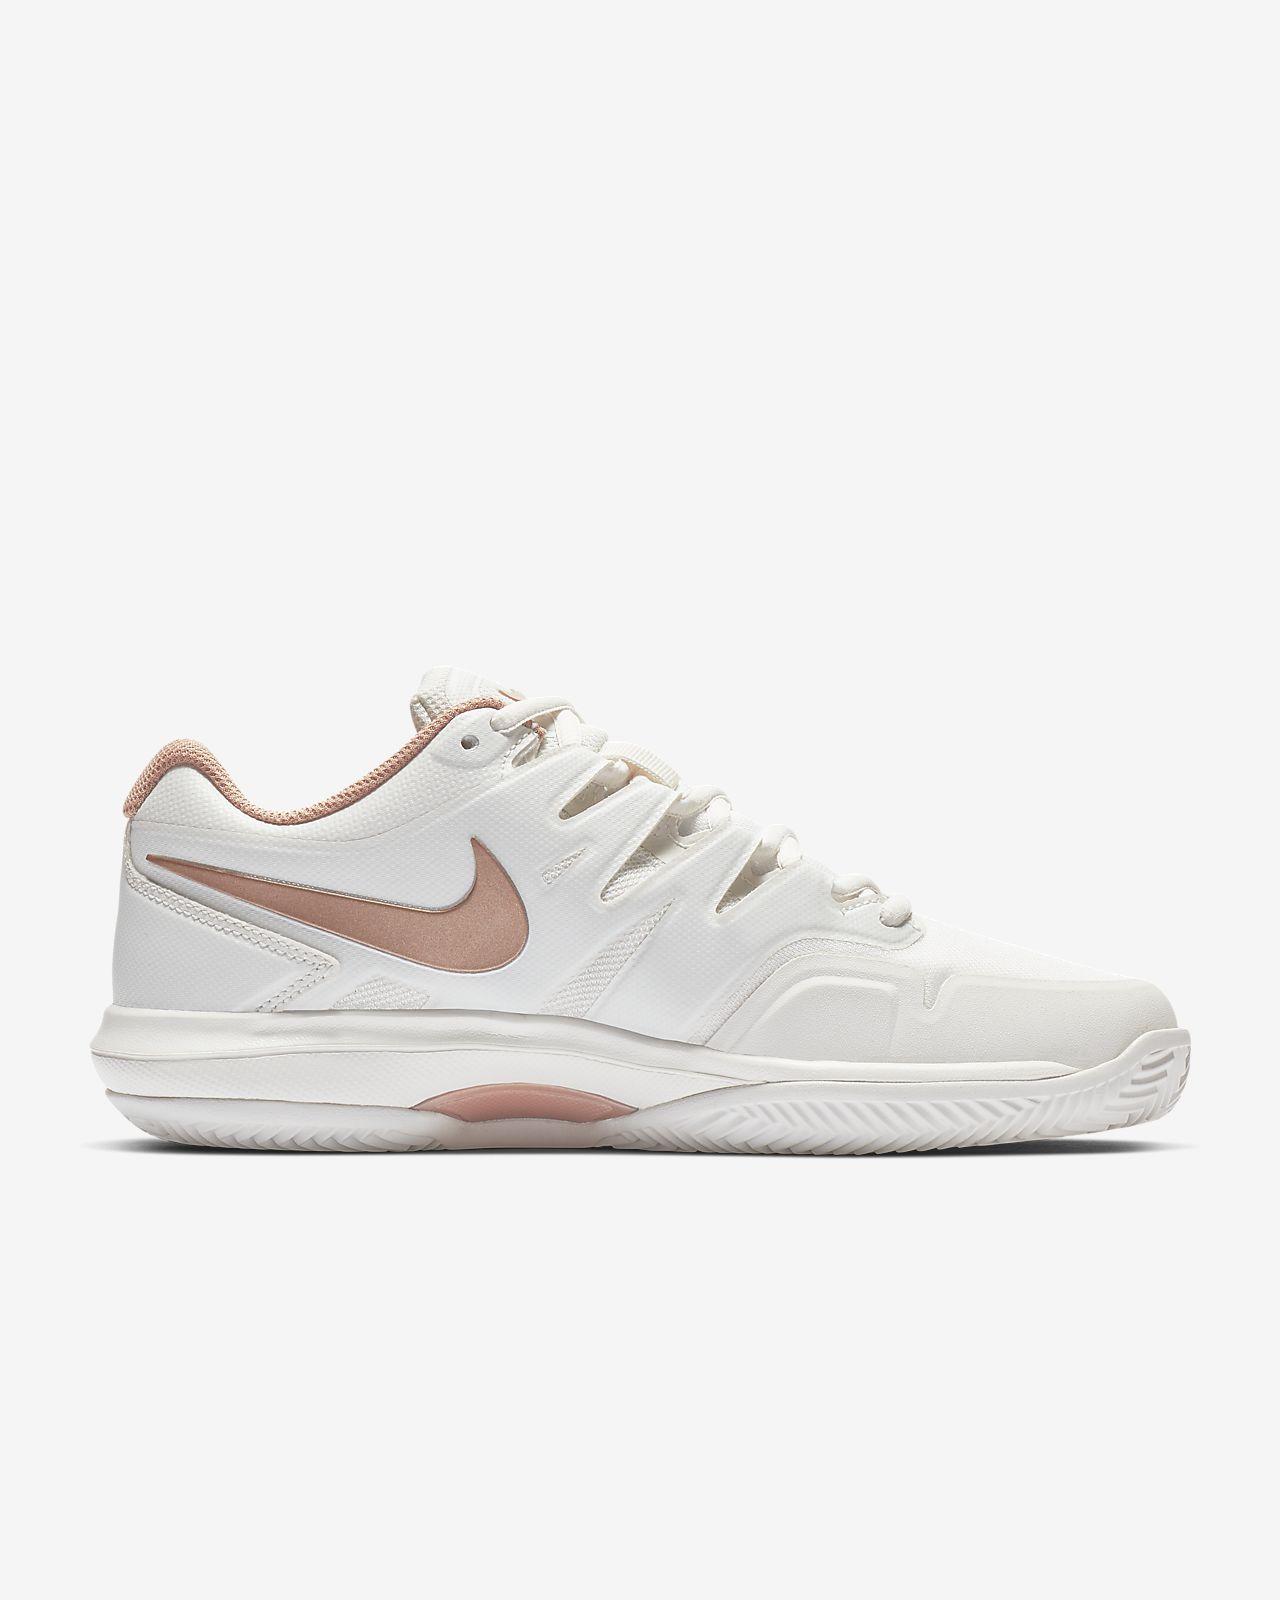 new style 5ee8d 64082 ... Nike Air Zoom Prestige Clay Women s Tennis Shoe